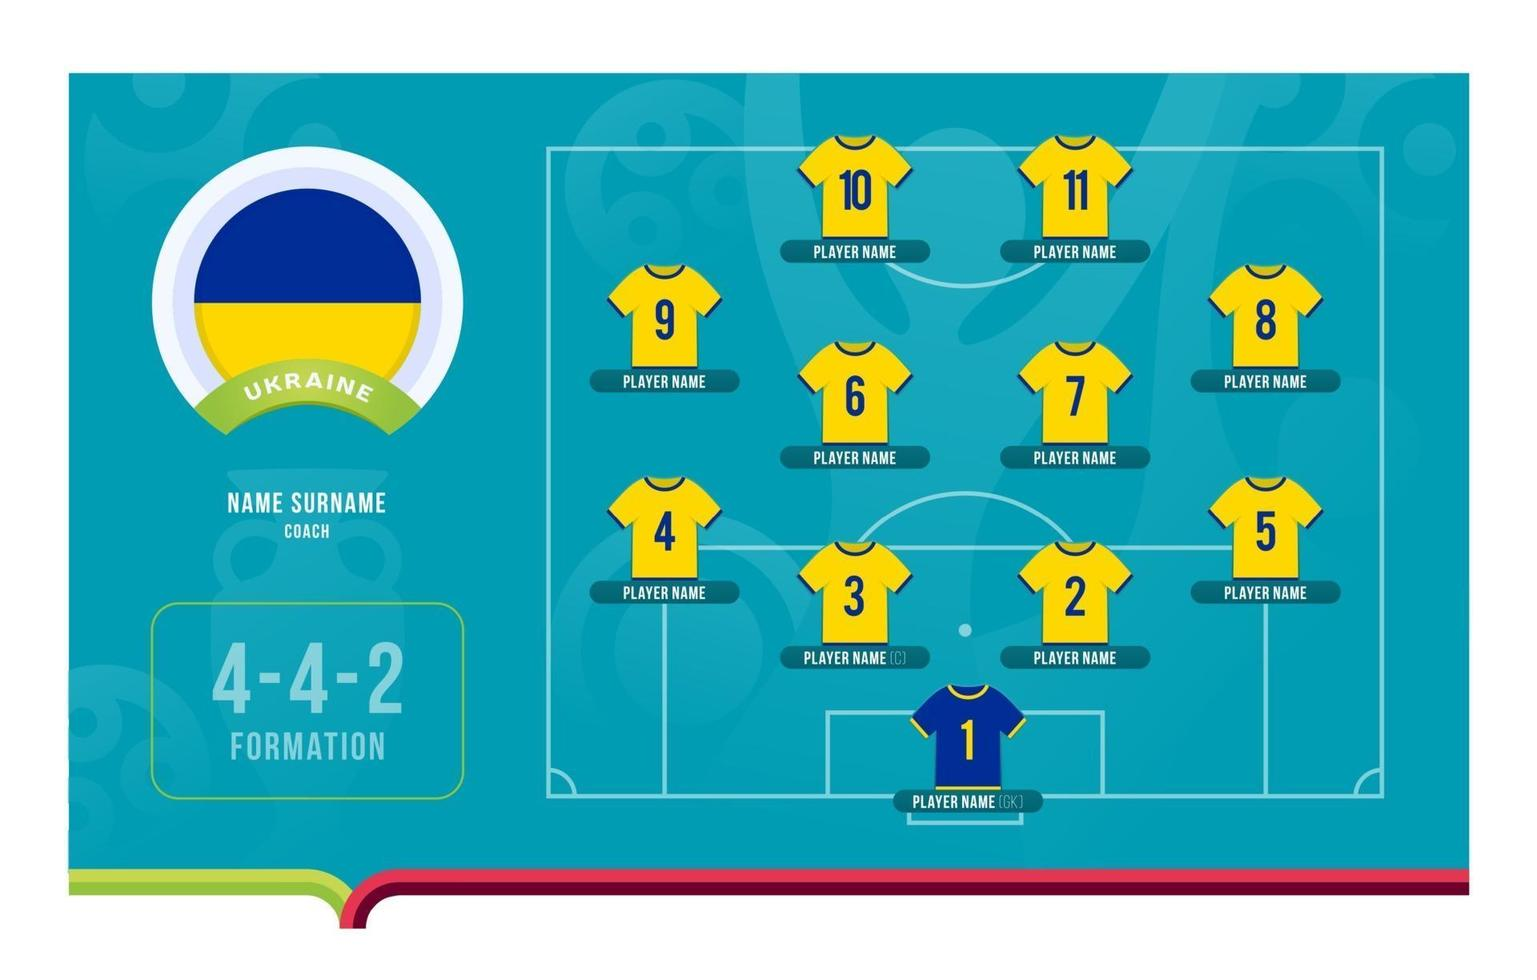 Ukraine line-up Football tournament final stage vector illustration